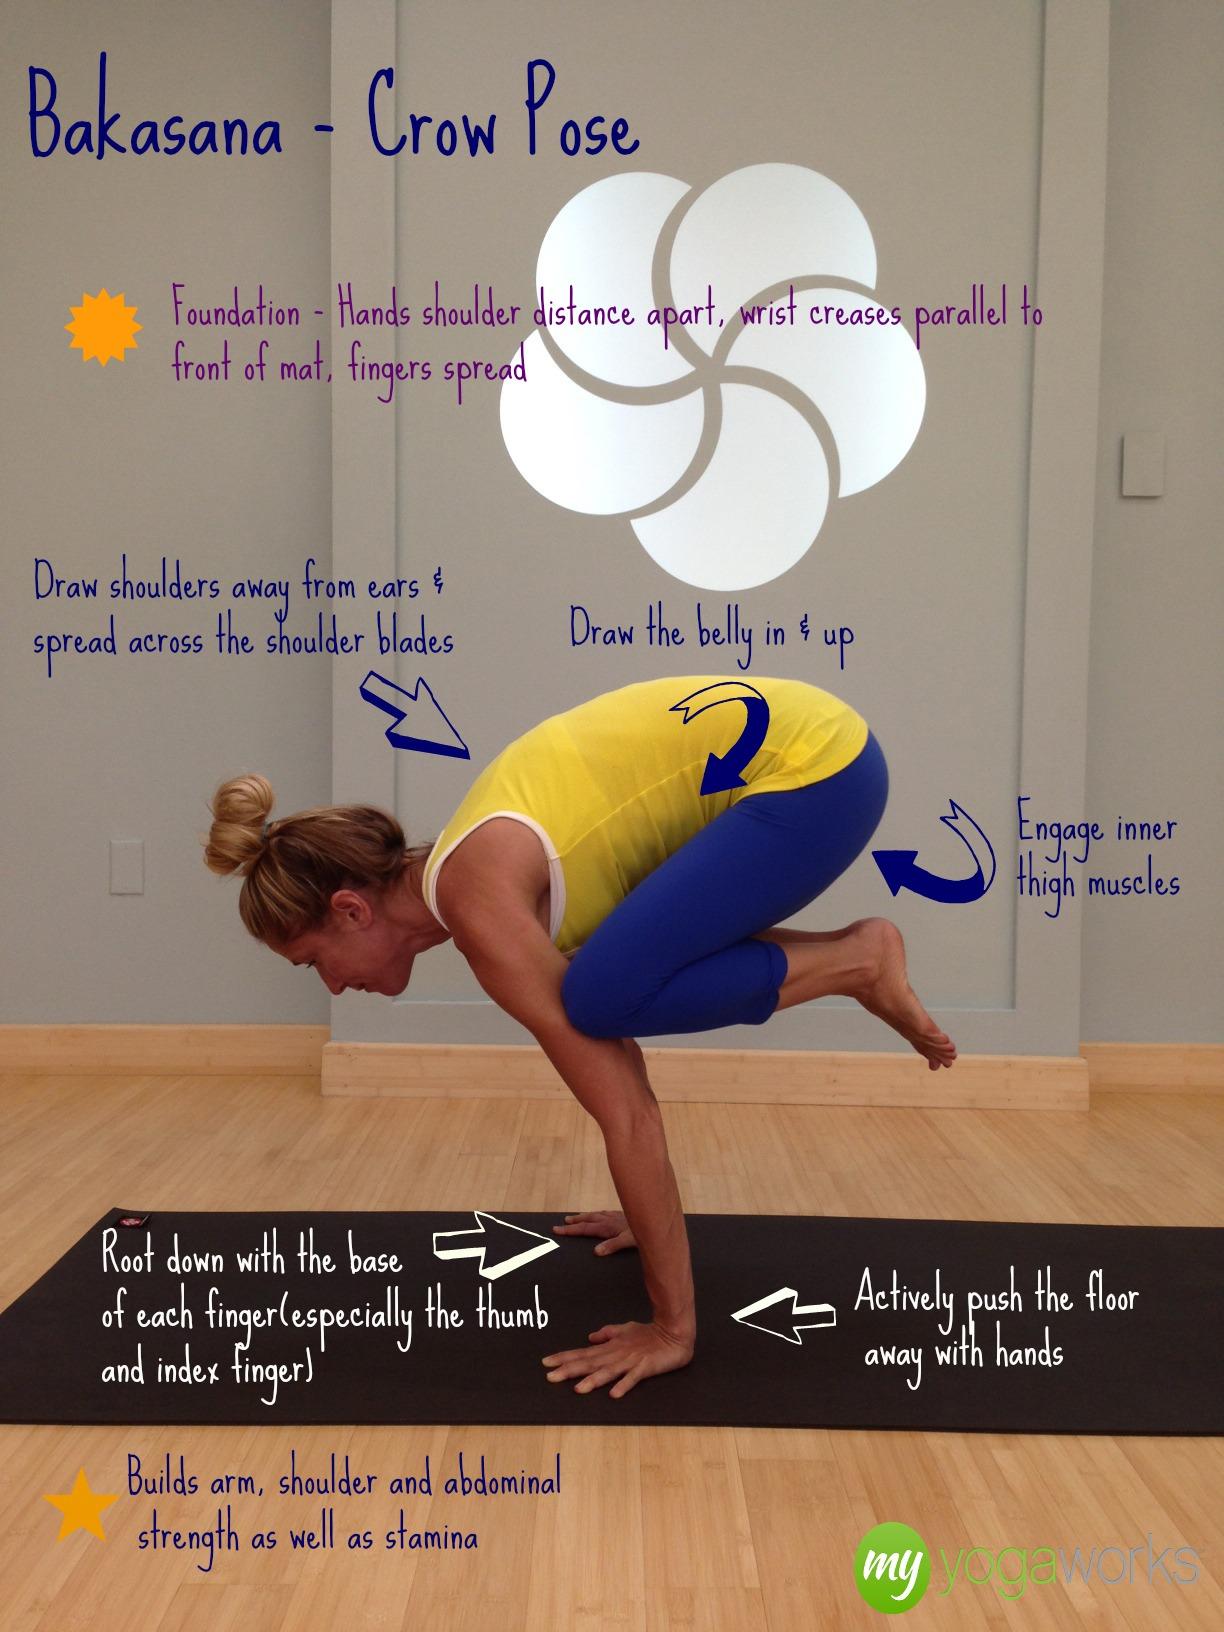 bakasana crow yoga pose and yoga videos online by MyYogaWorks